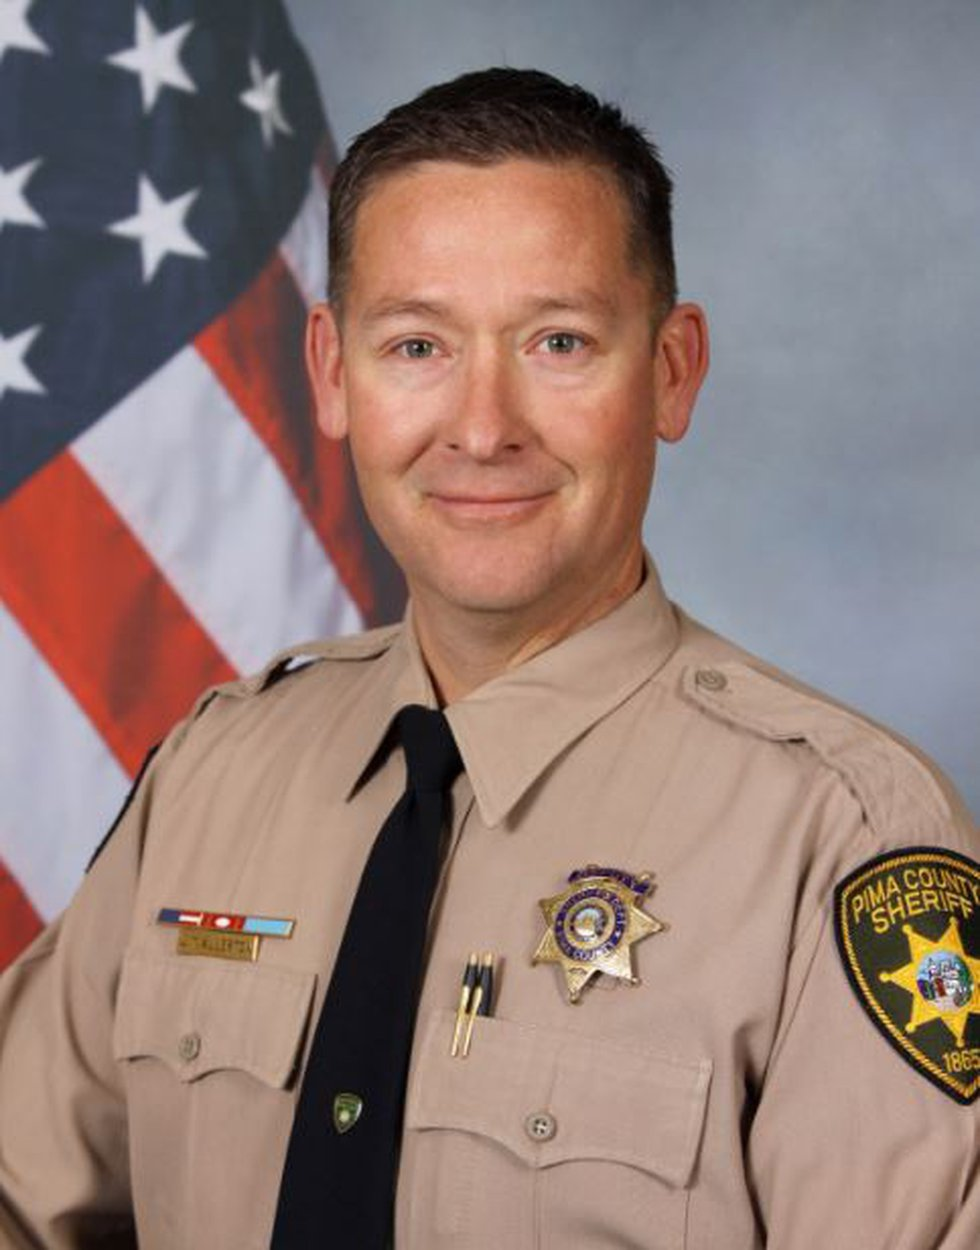 James Allerton (Source: Southern Arizona Law Enforcement Foundation)